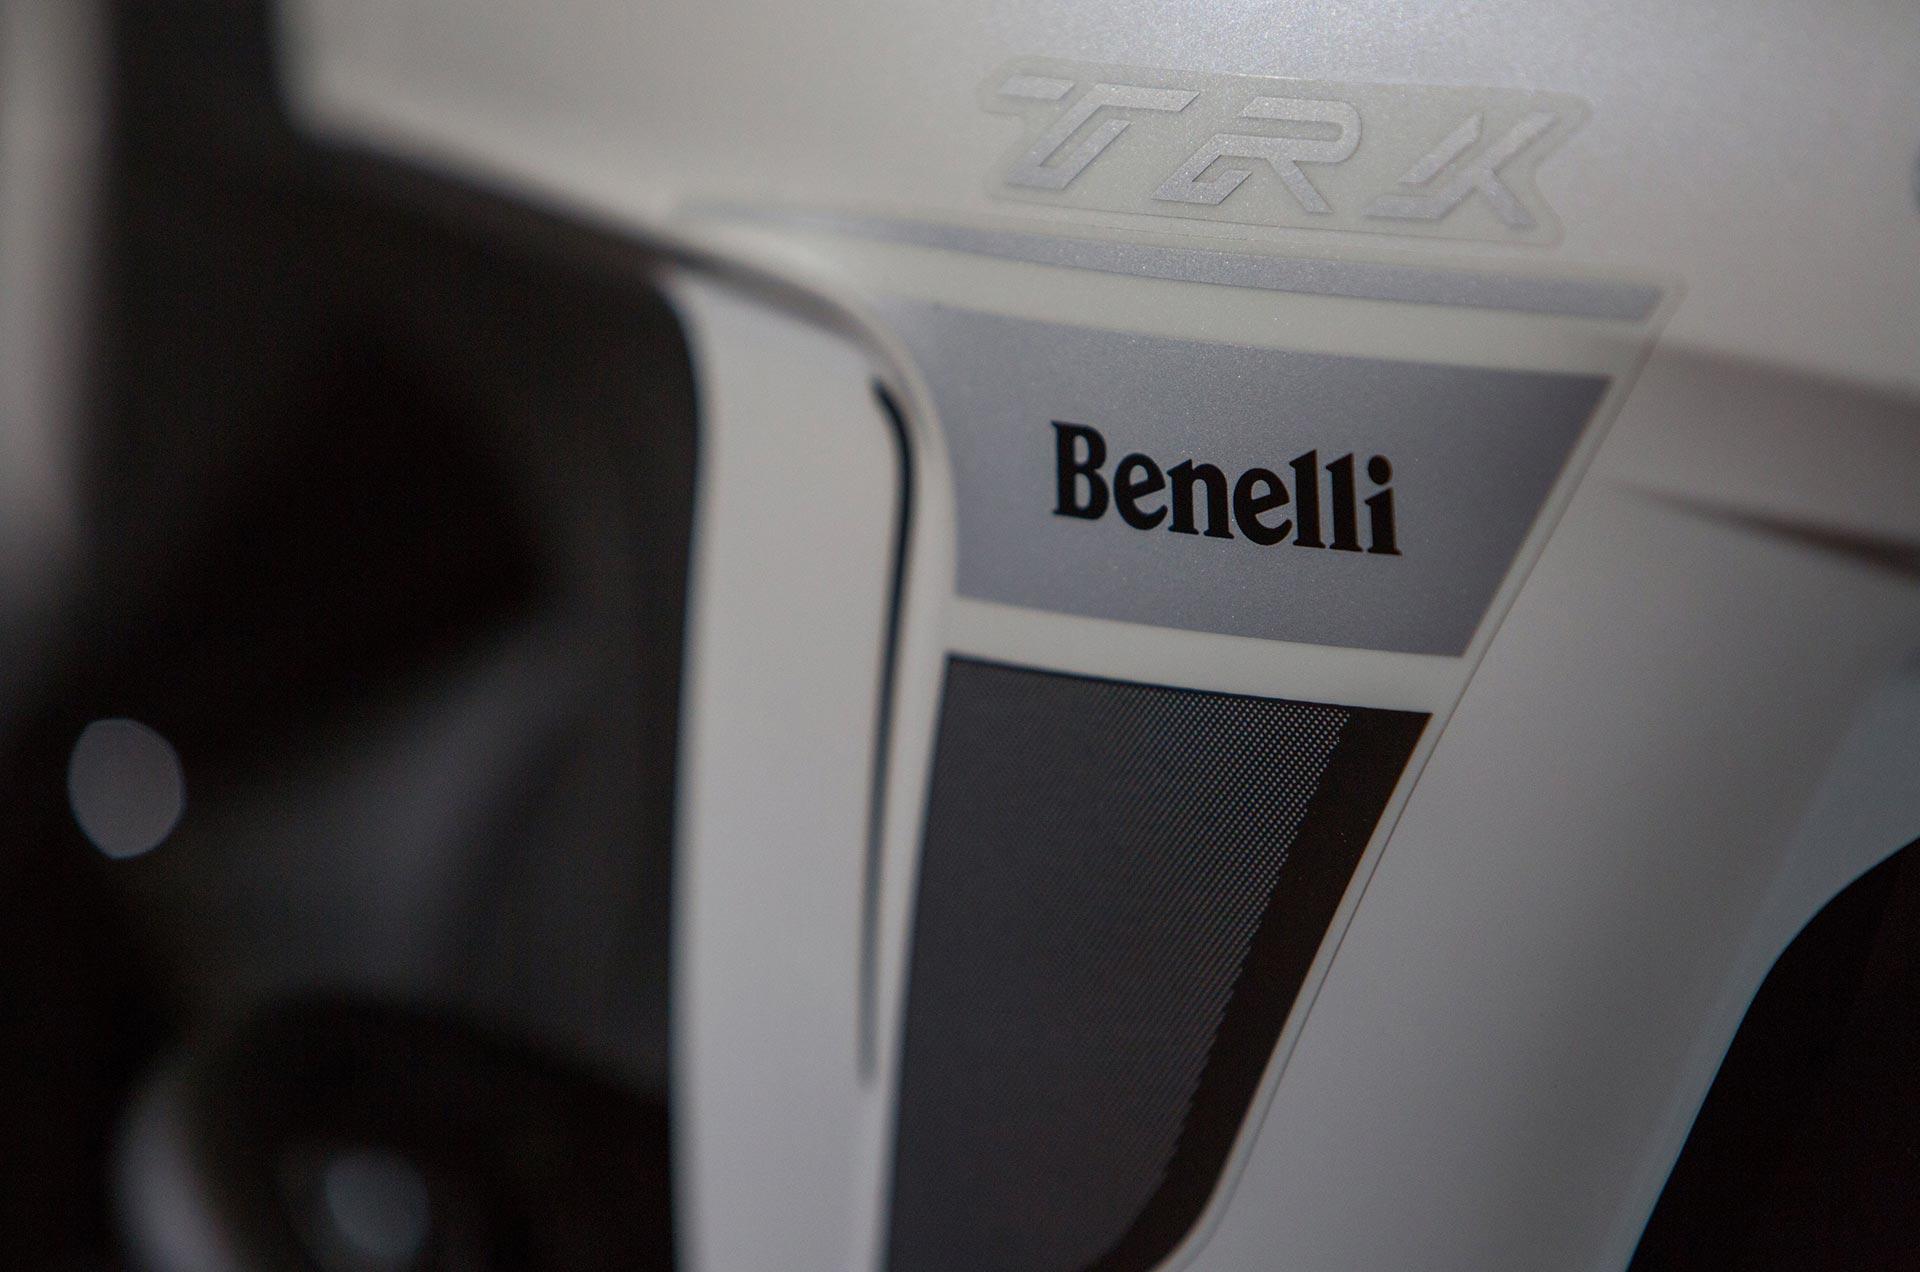 josts-toeff-lade-ag_Benelli-TRK-502_08